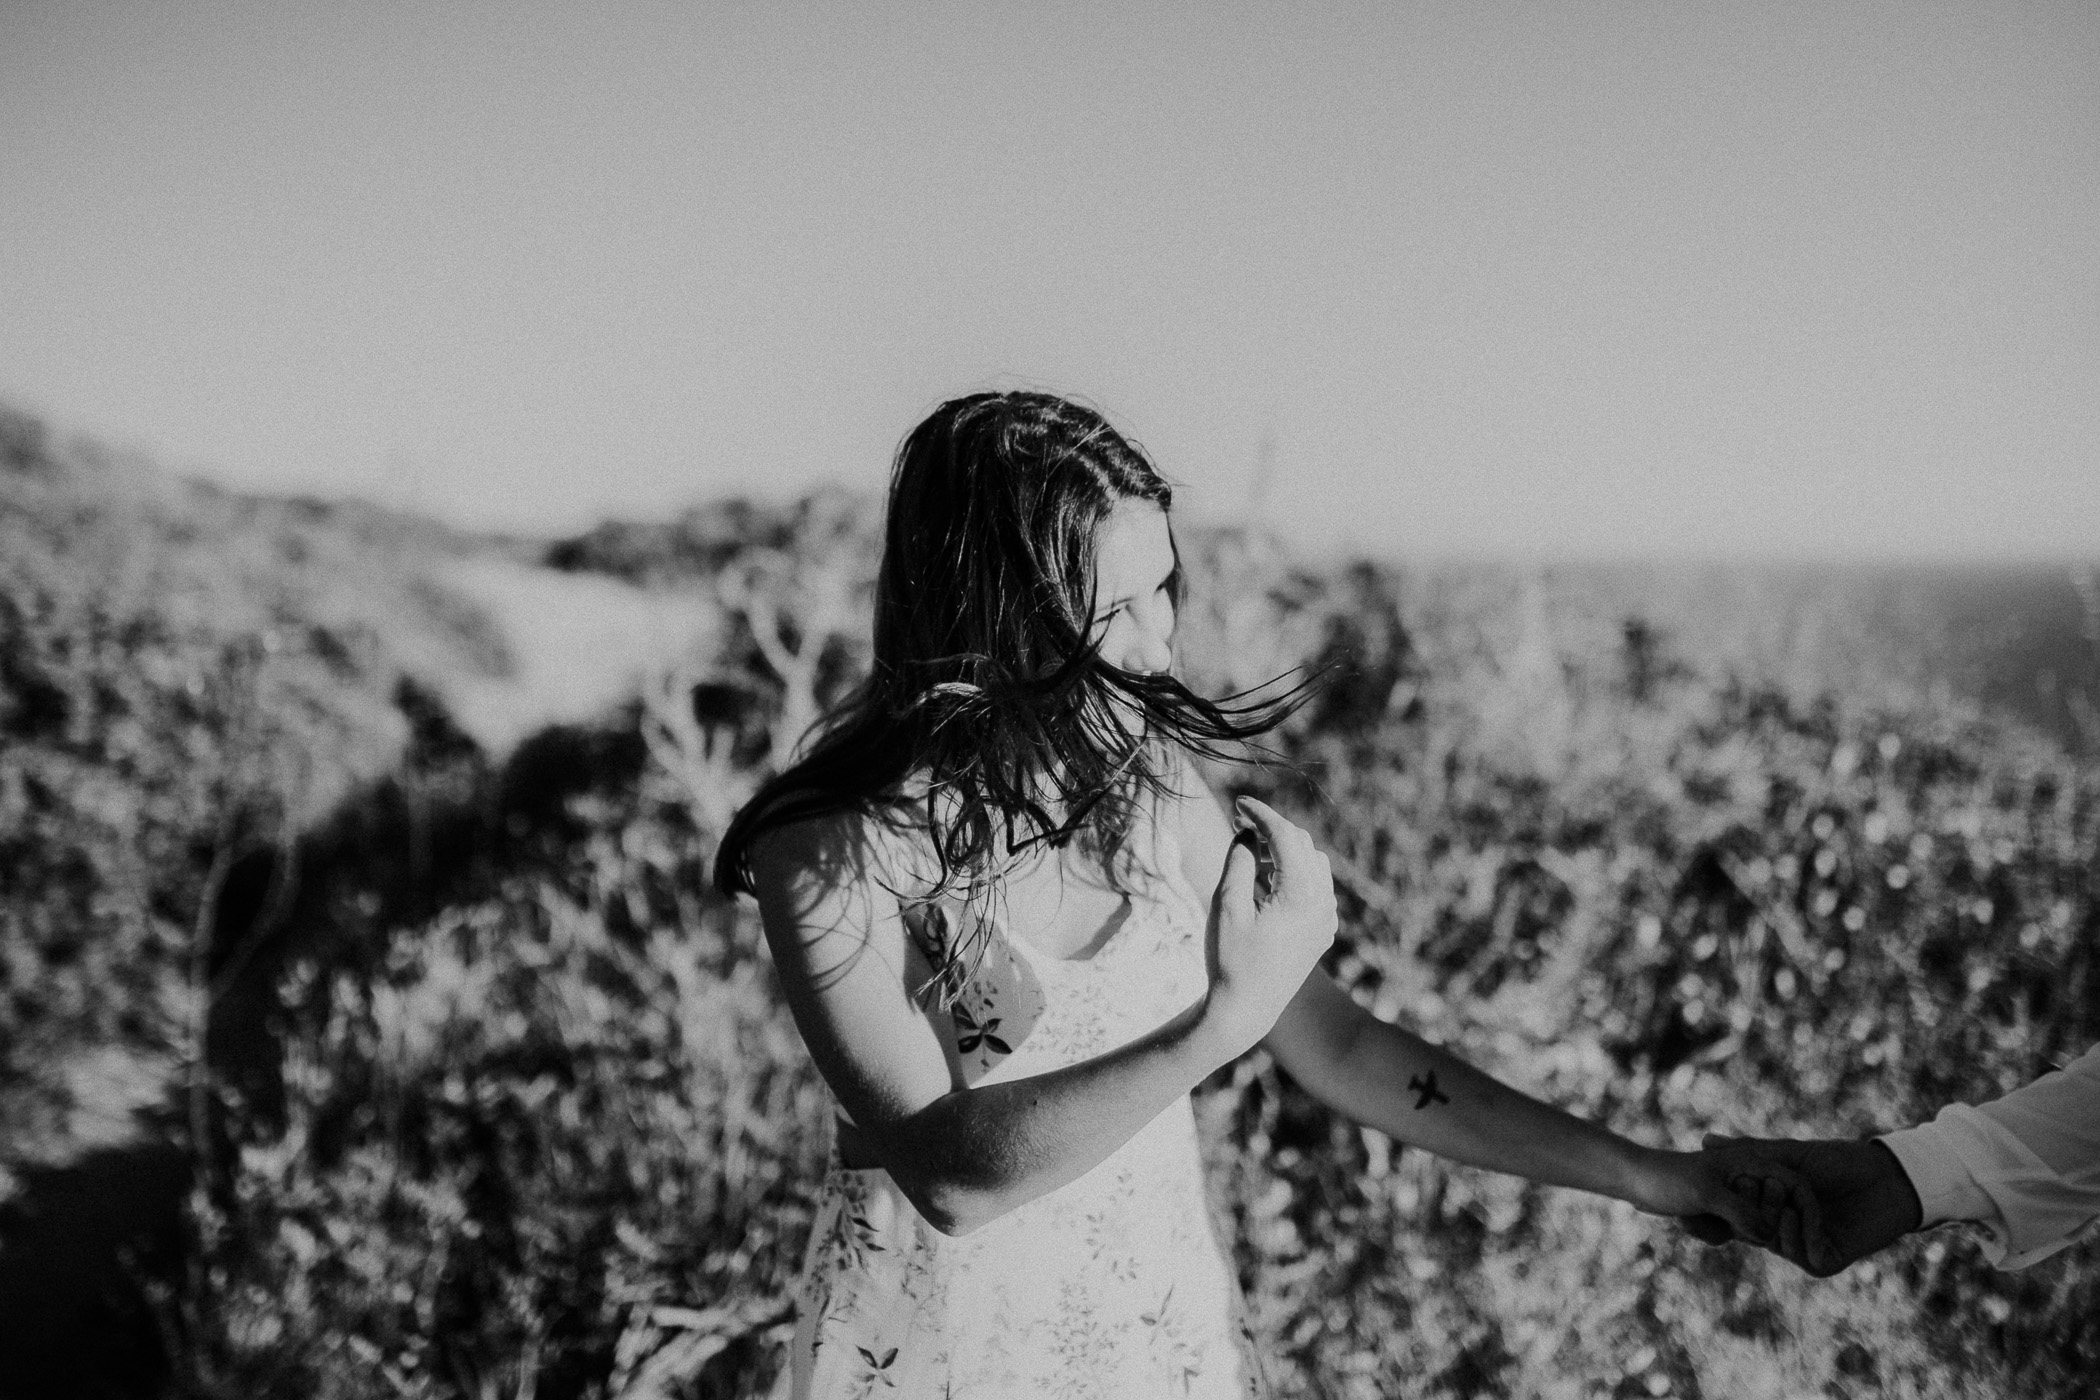 DanielaMarquardtPhotography_wedding_elopement_mallorca_spain_calapi_palma_lauraandtoni_300